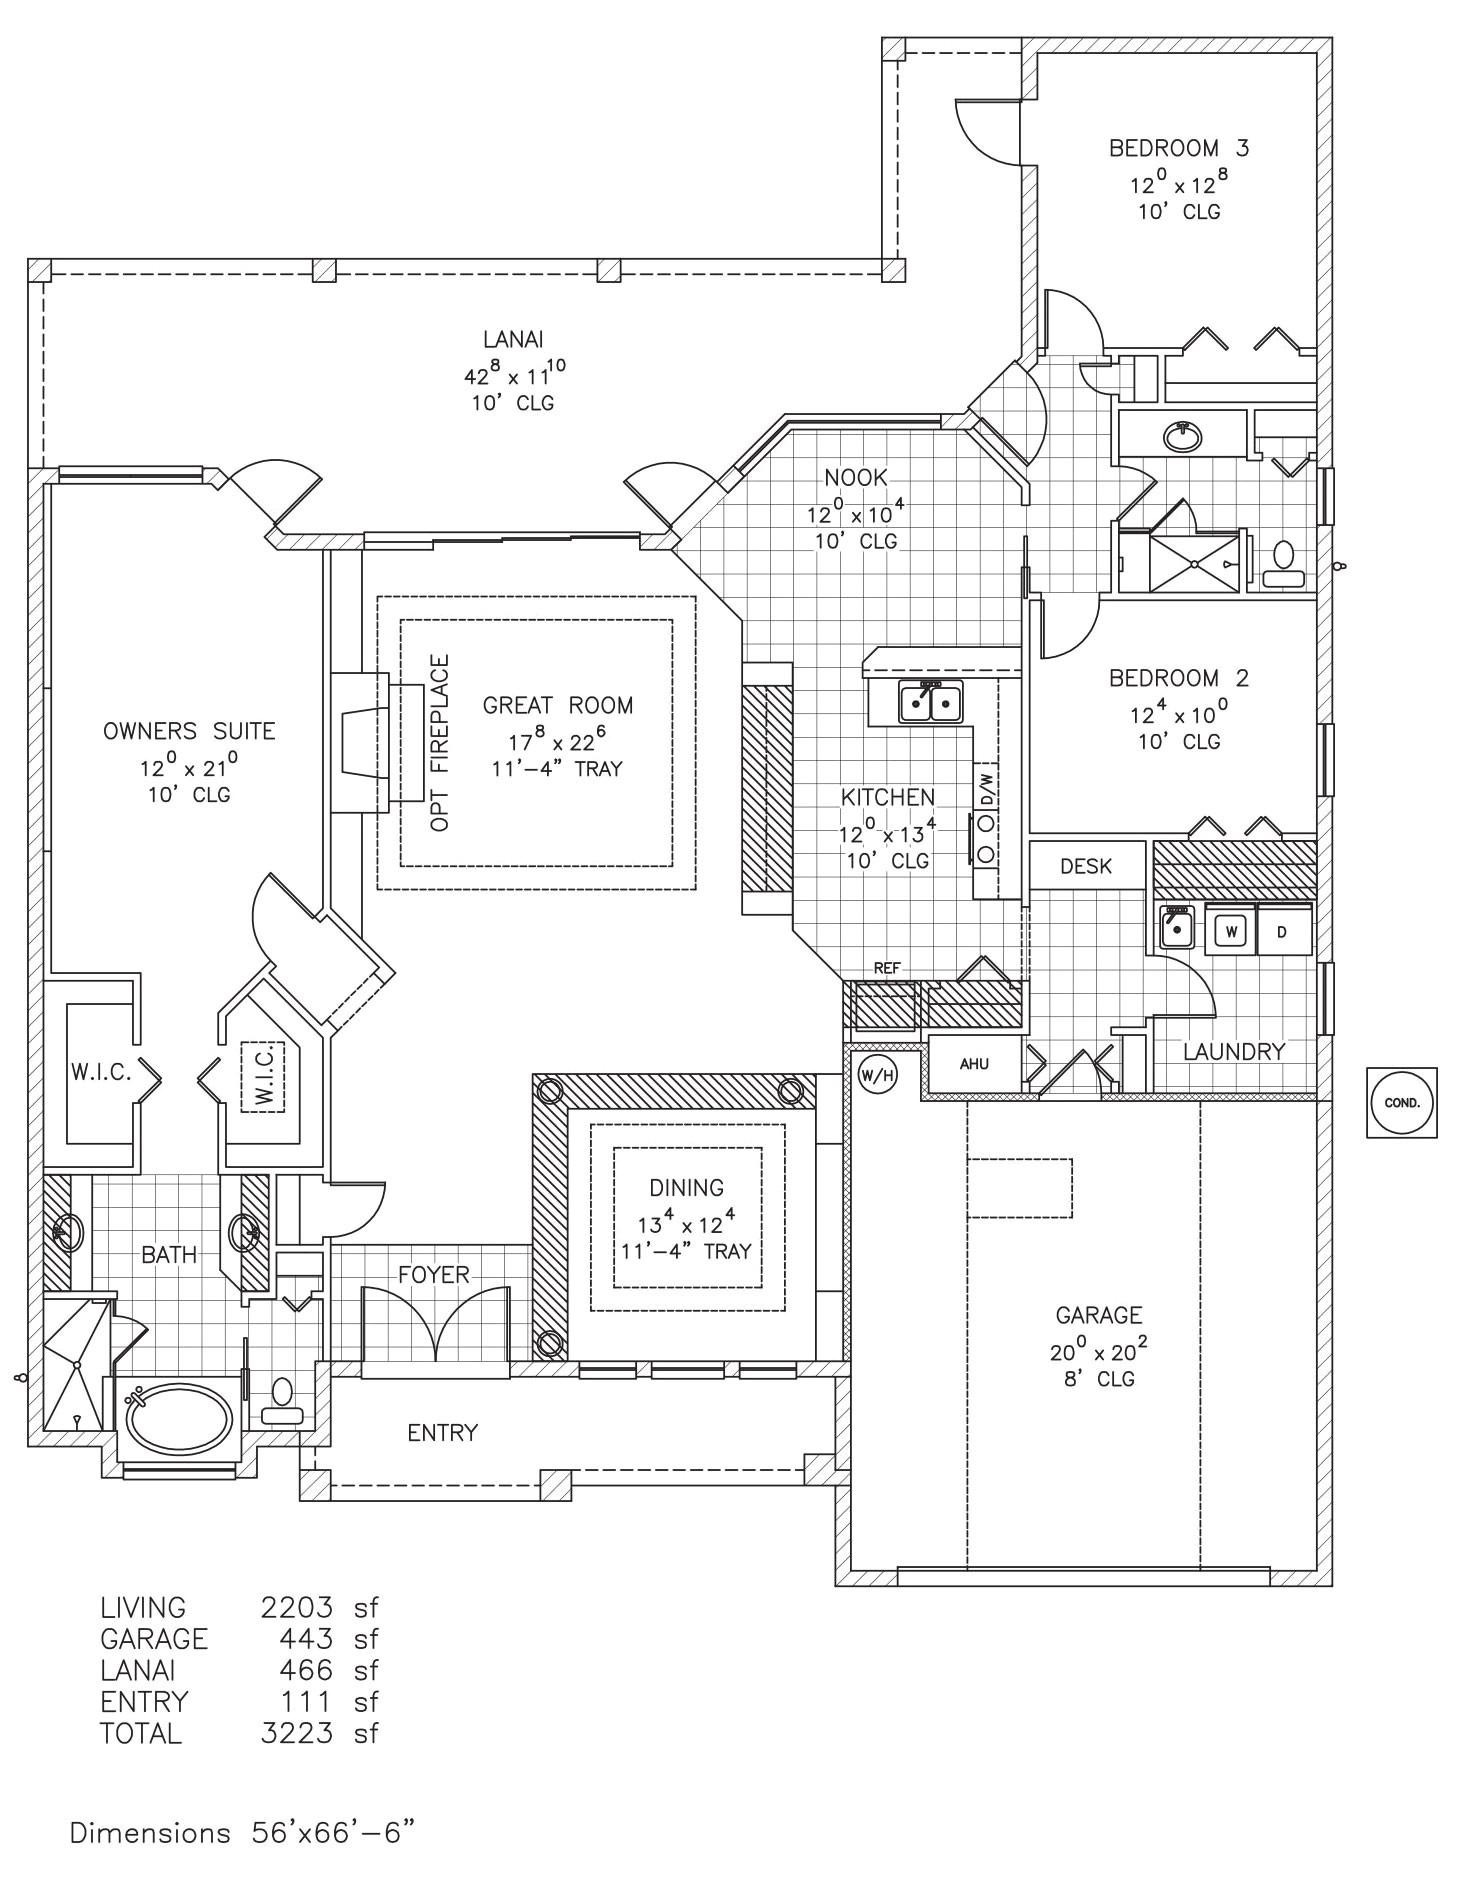 duran homes floor plans awesome carolina new home floor plan palm coast and flagler beach fl